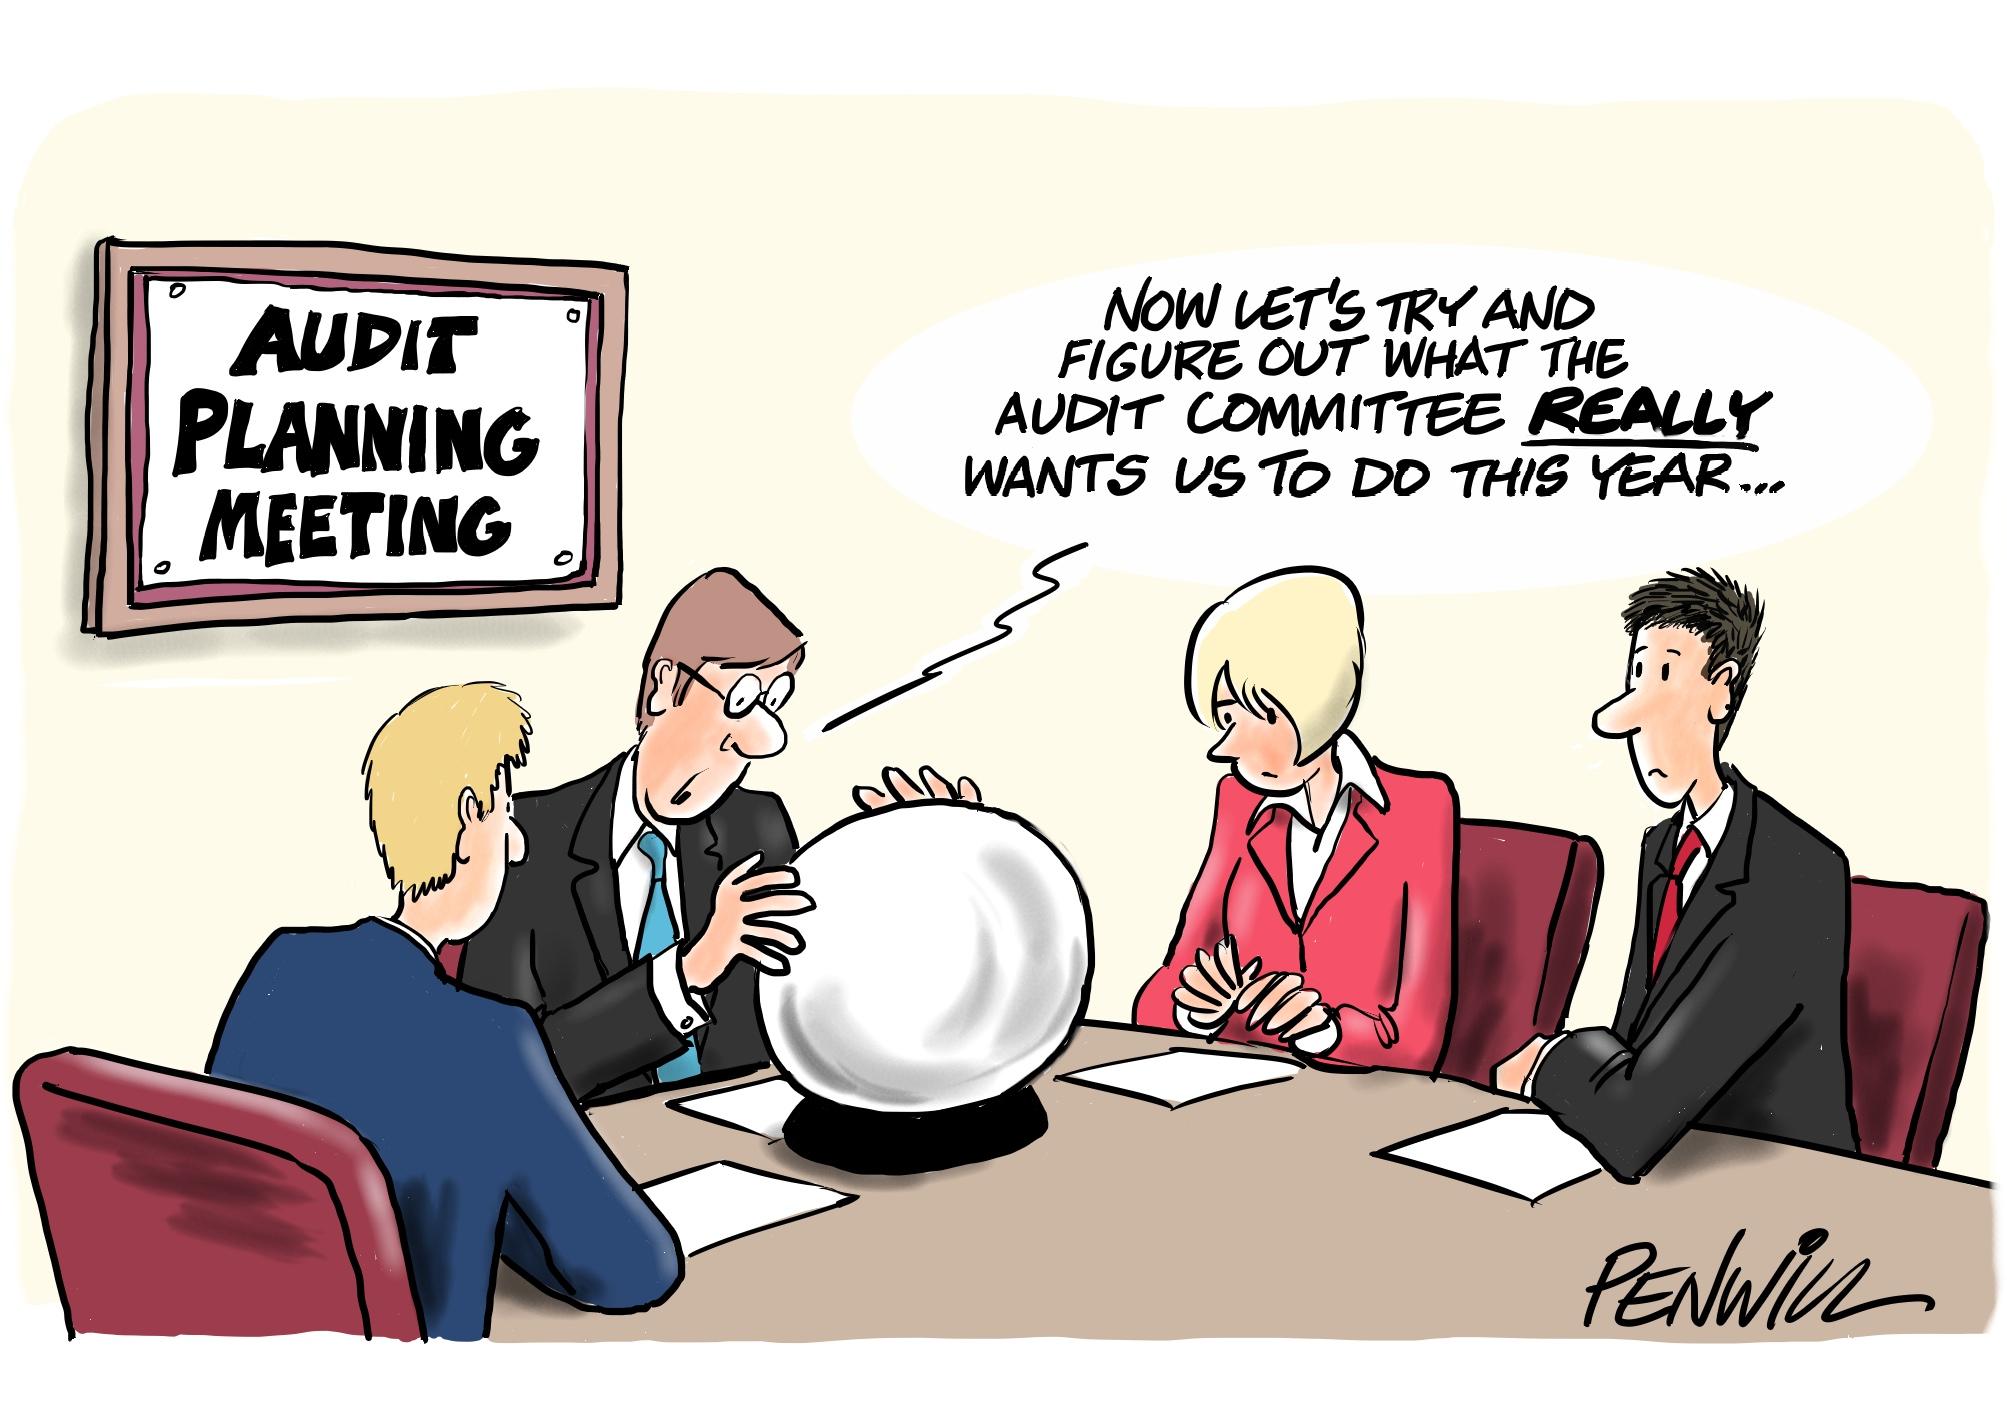 Audit-planning-meeting